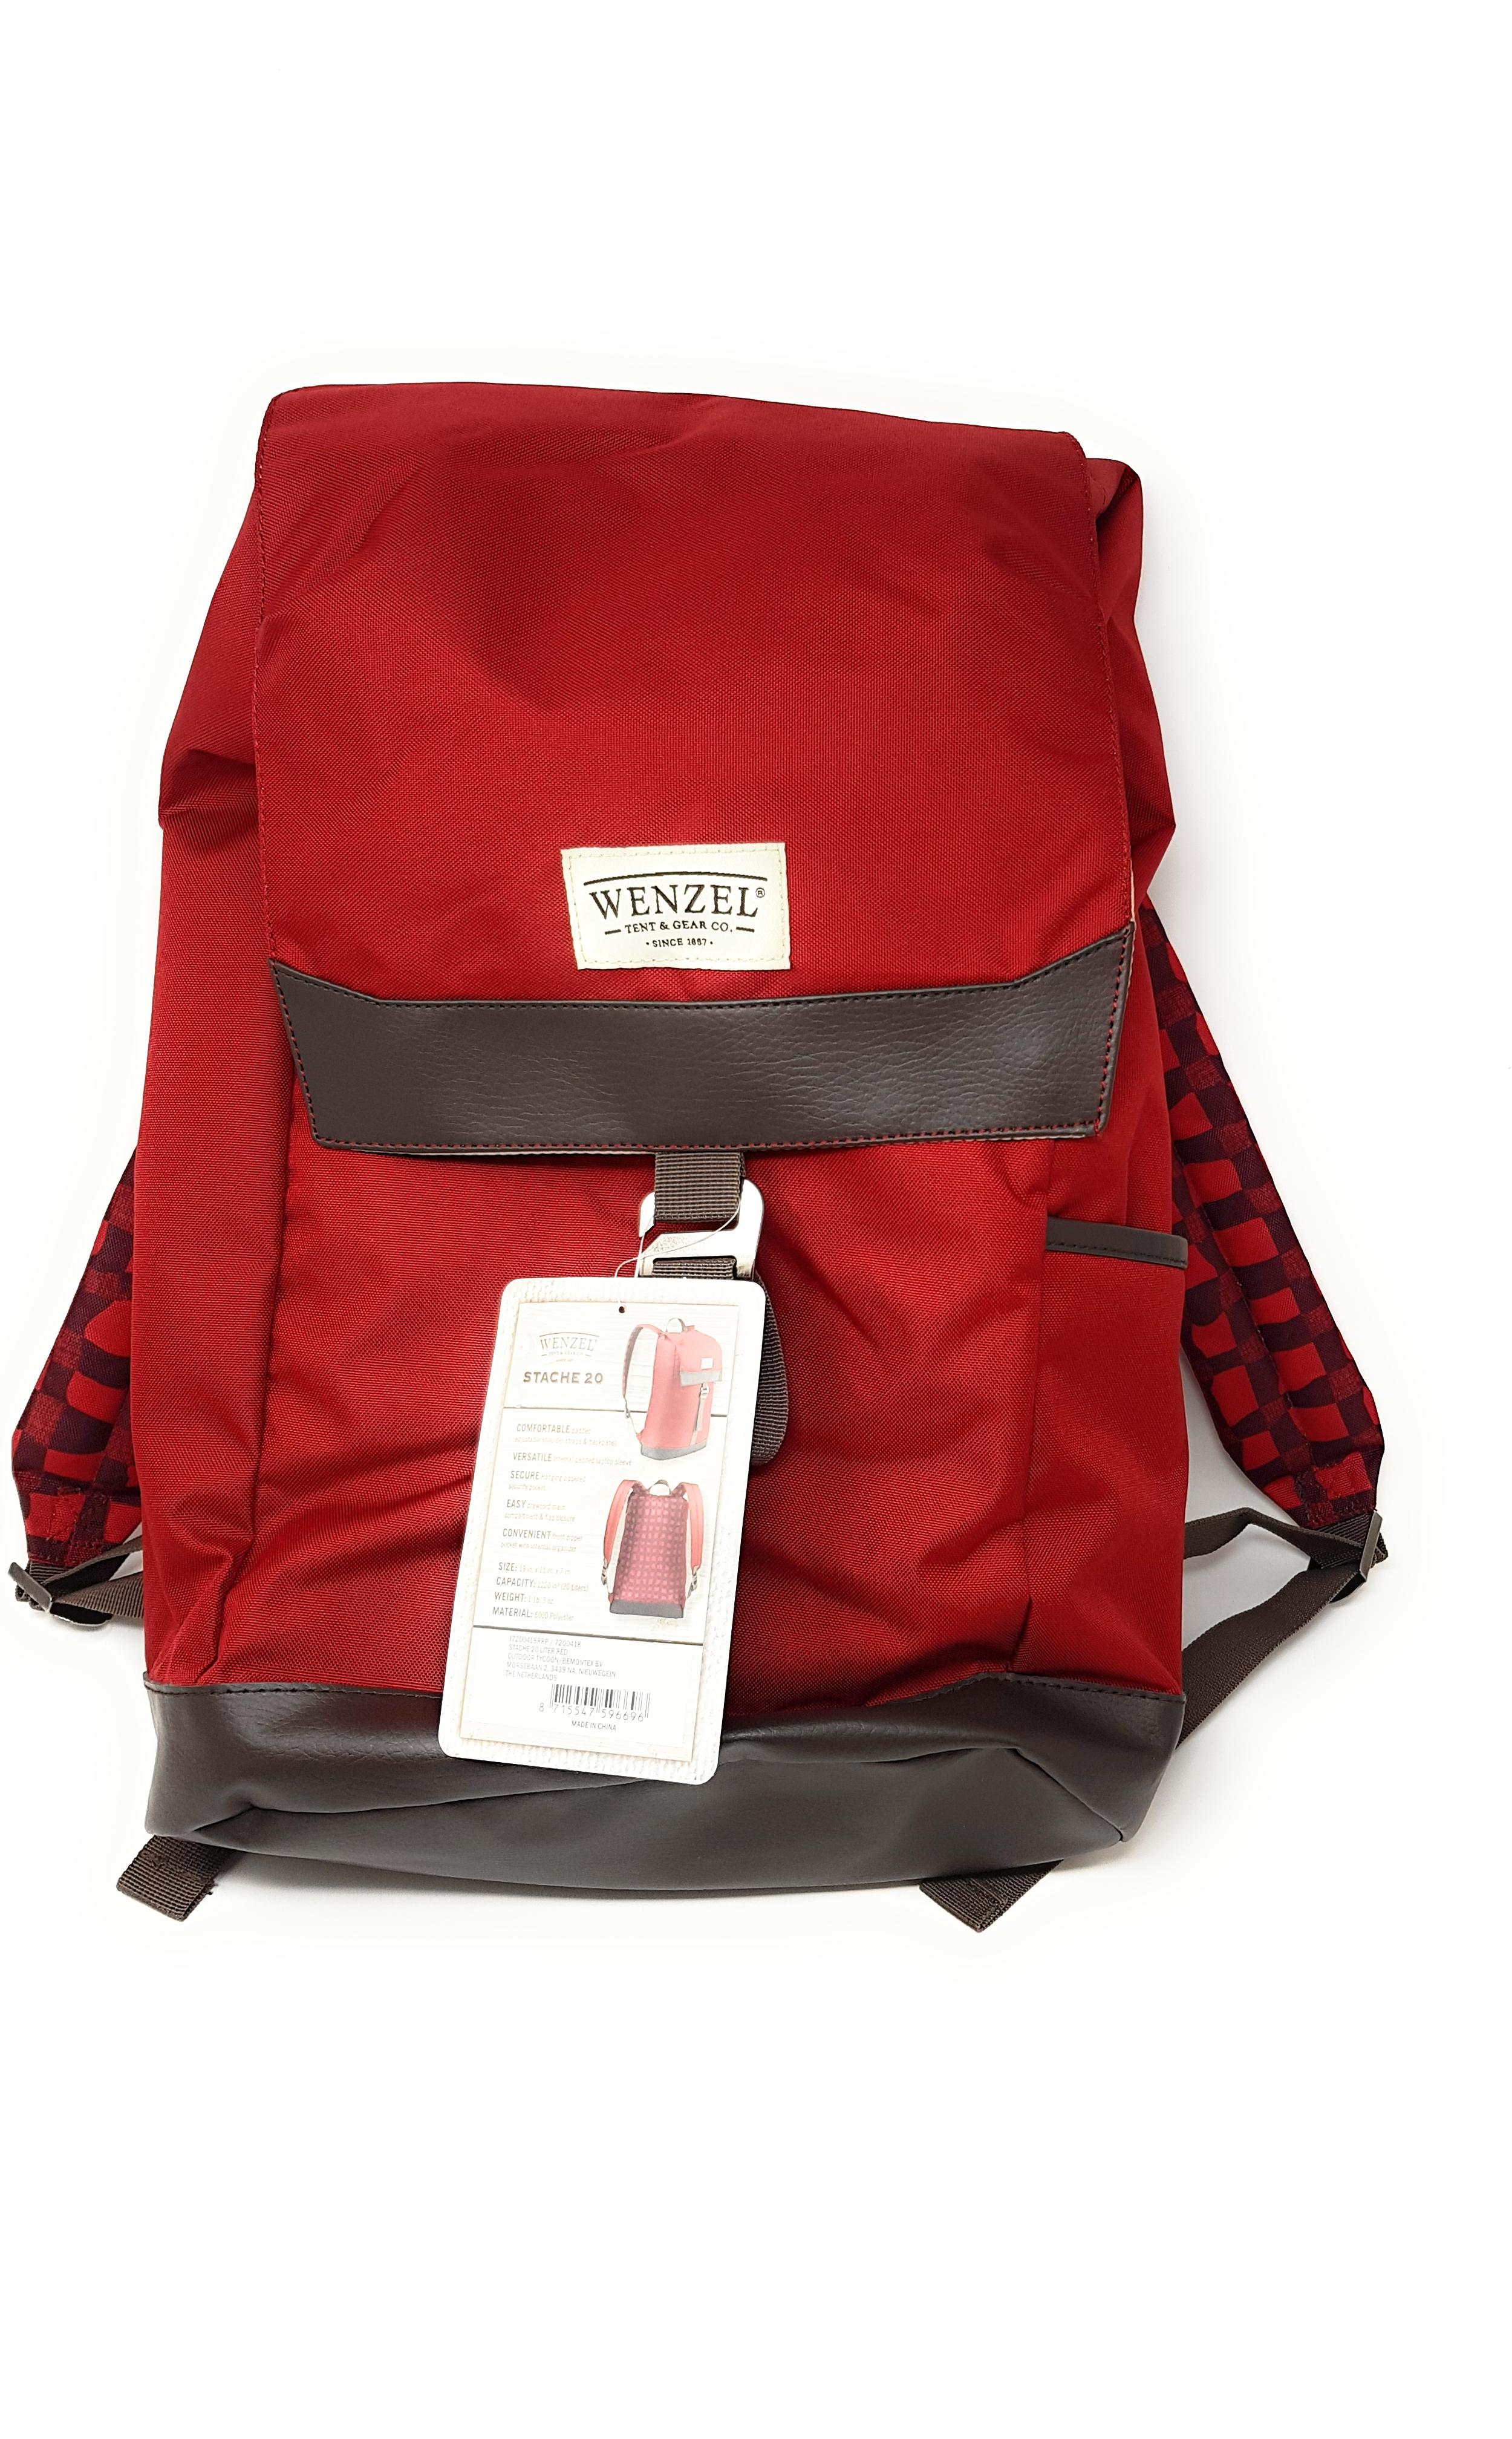 e4dda3024c066 Wenzel Damen Herren Rucksack Bag Backpack Outdoor Wandern Reisen Rot 20 L